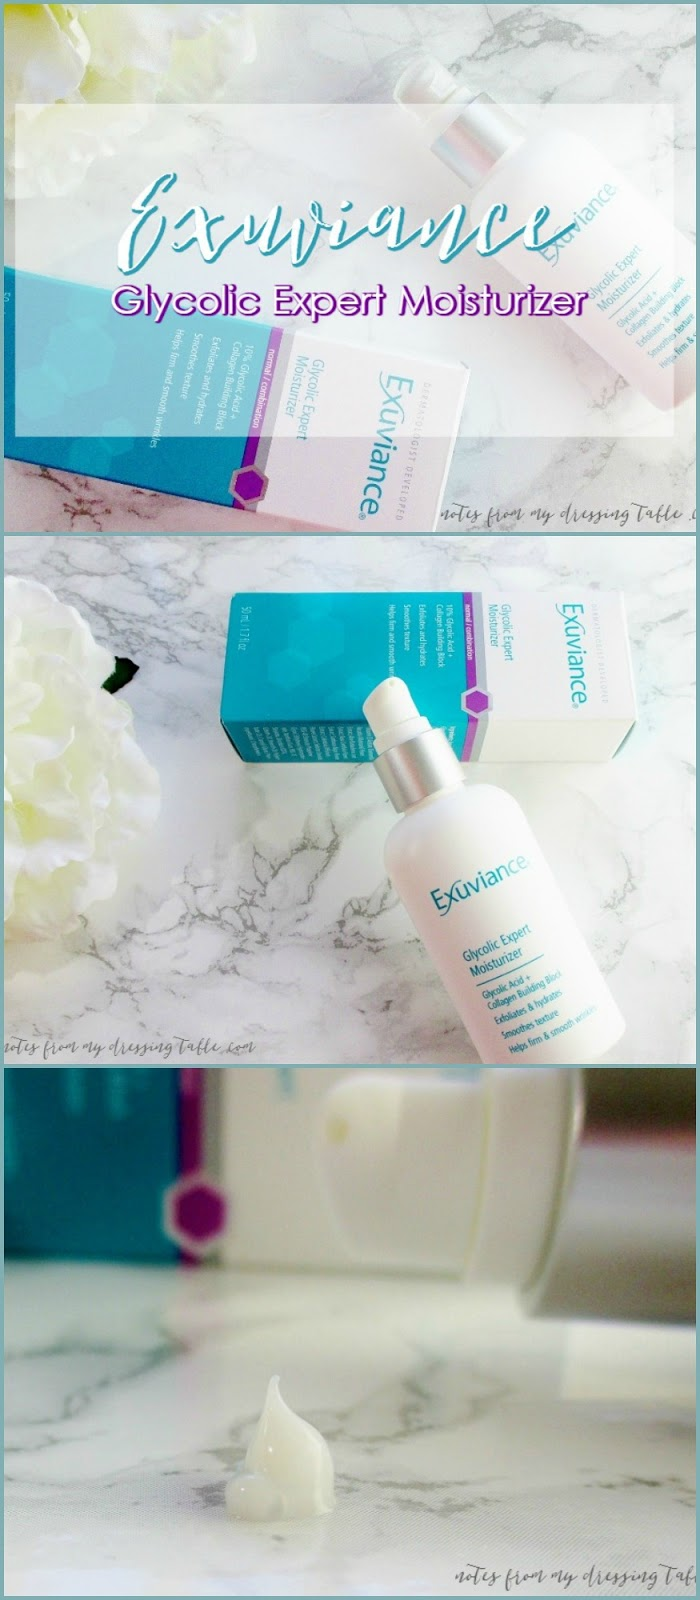 exuviance-glycolic-expert-moisturizer-4